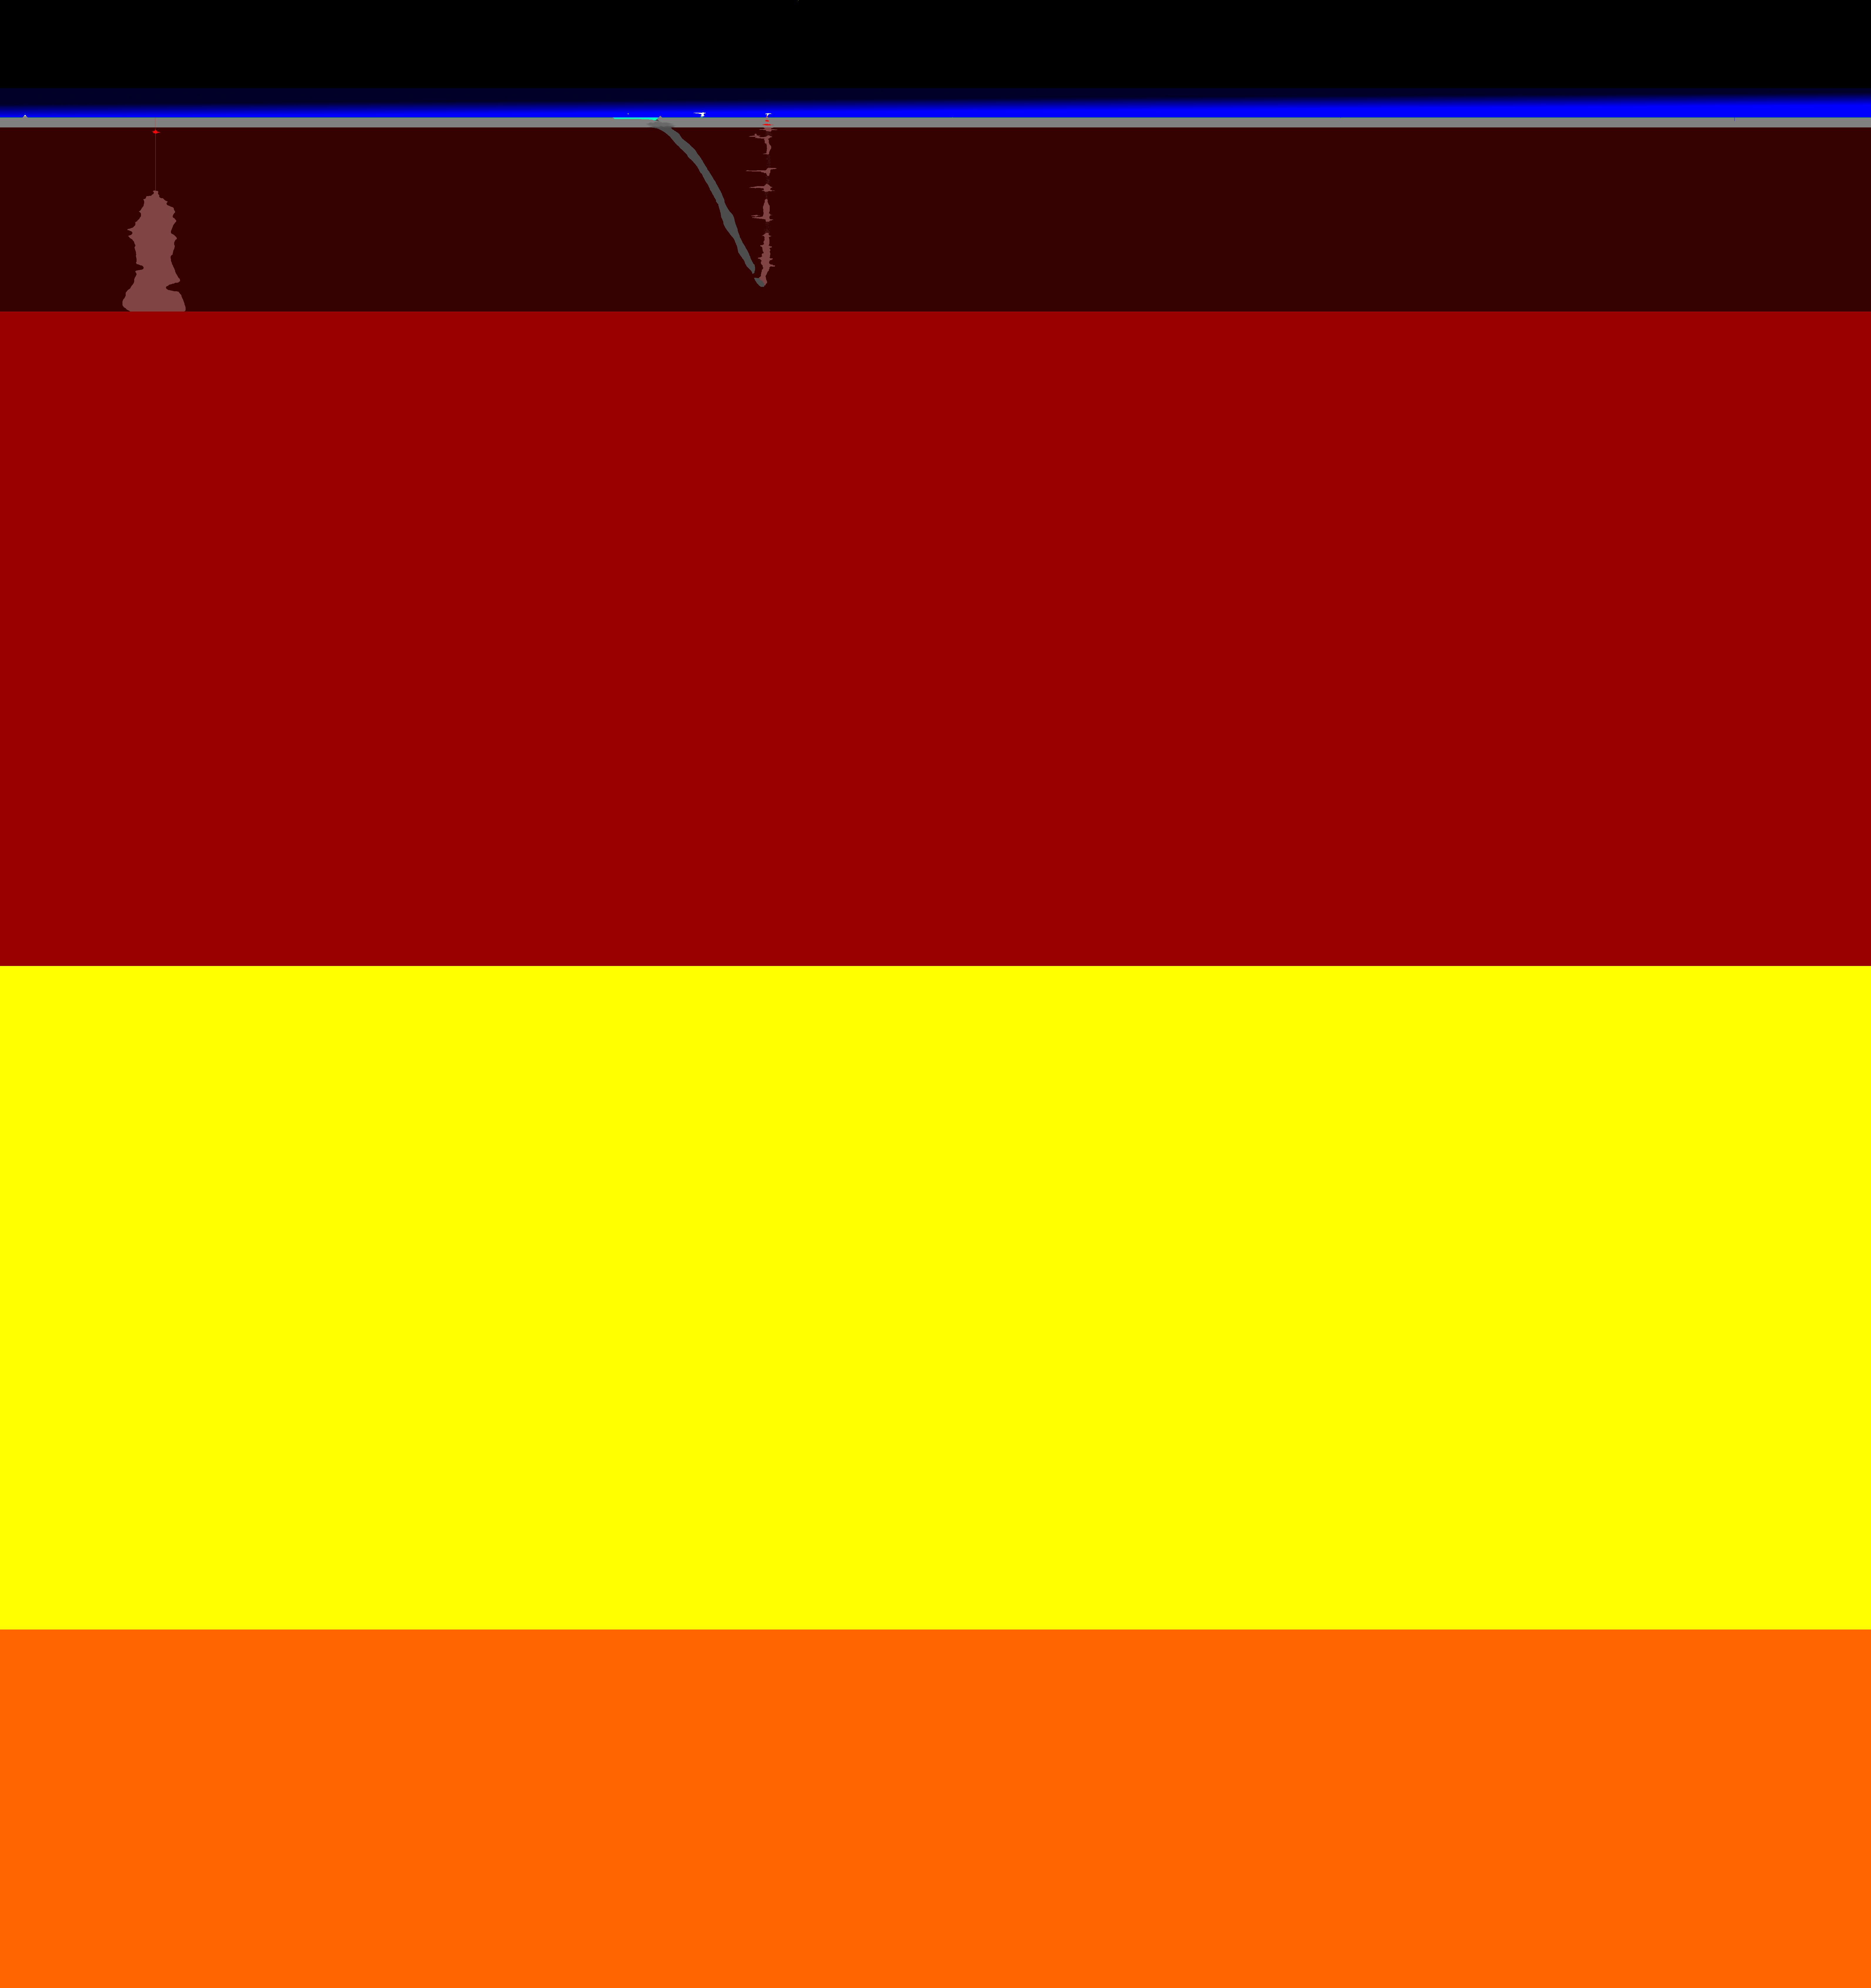 1 Radian Wedge Pixel Art.png